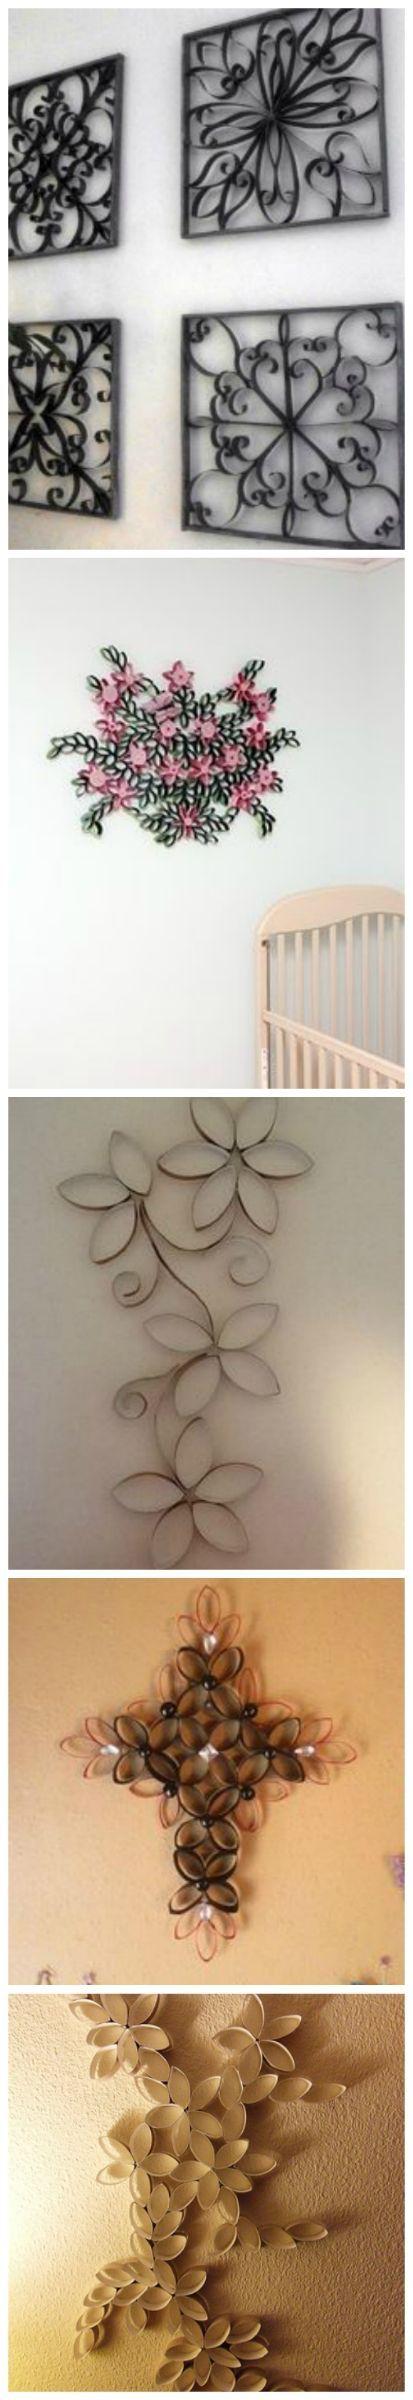 DIY Project- Toilet Paper Roll Wall Art